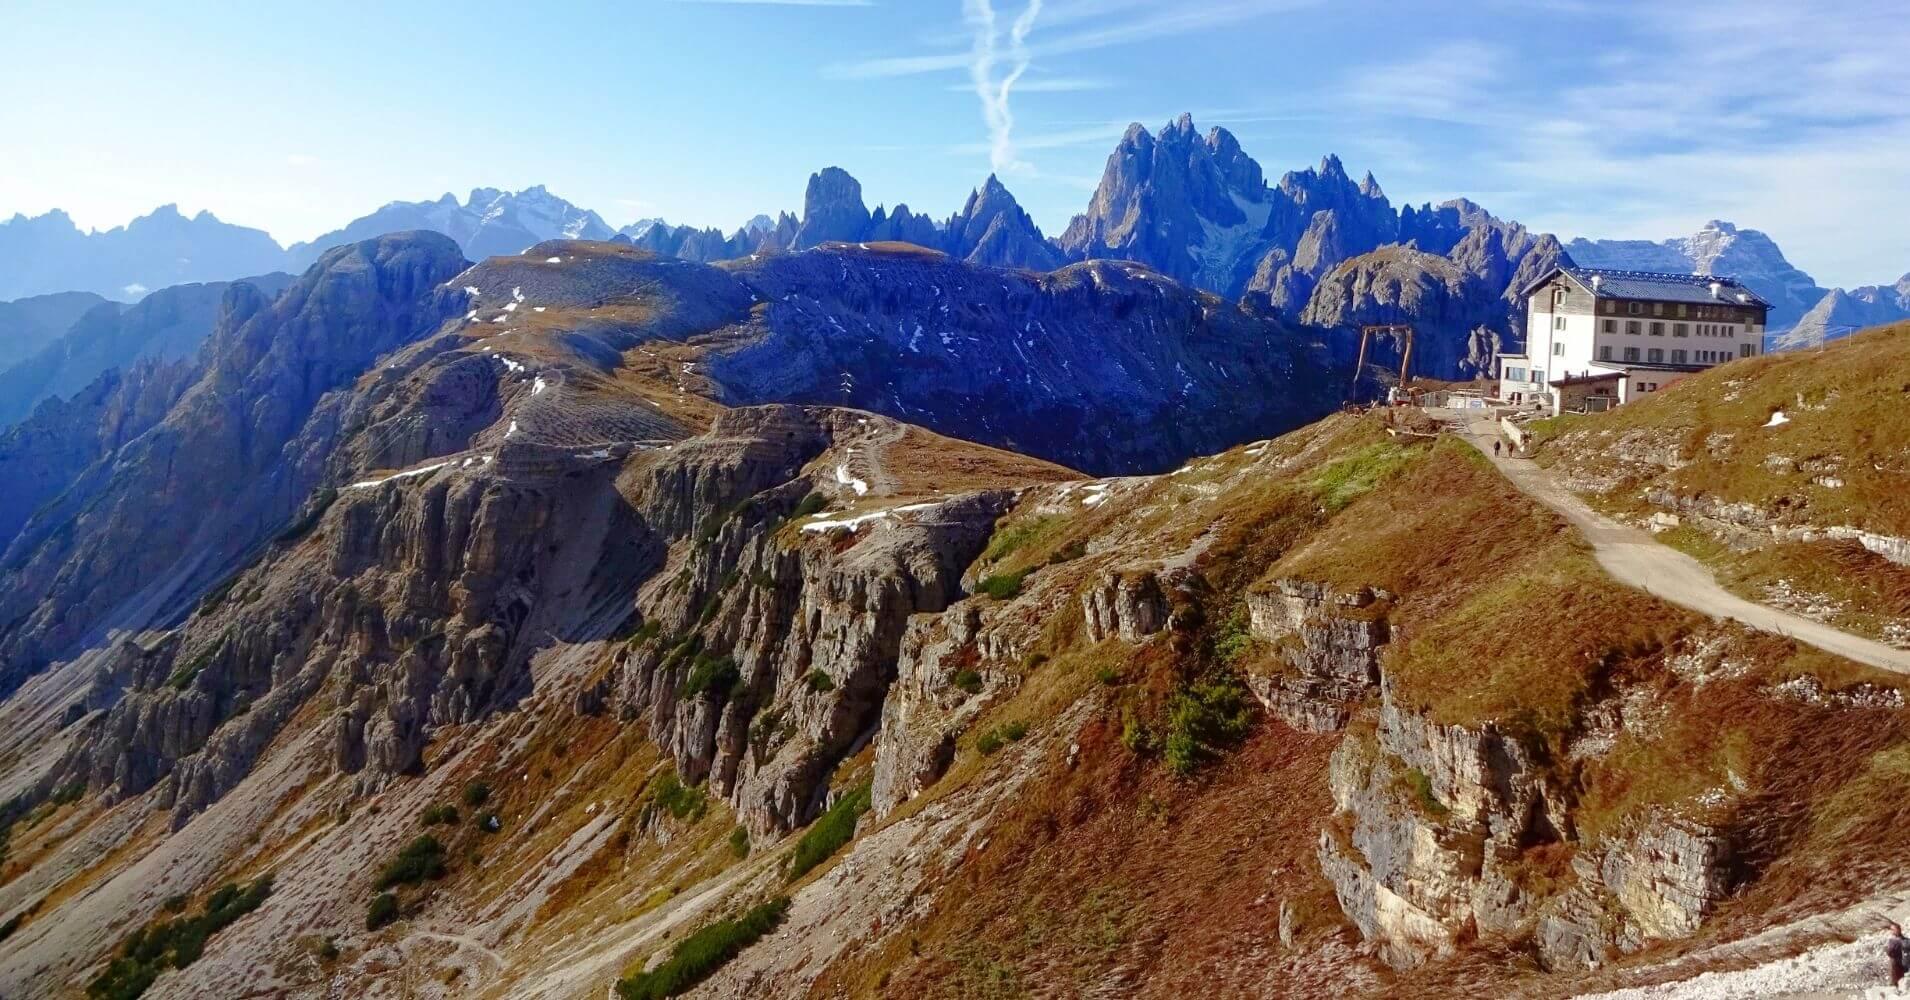 Alpes Dolomitas. Refugio de Arounzo. Alrededores de Cortina d' Ampezzo. Belluno, Véneto. Italia.